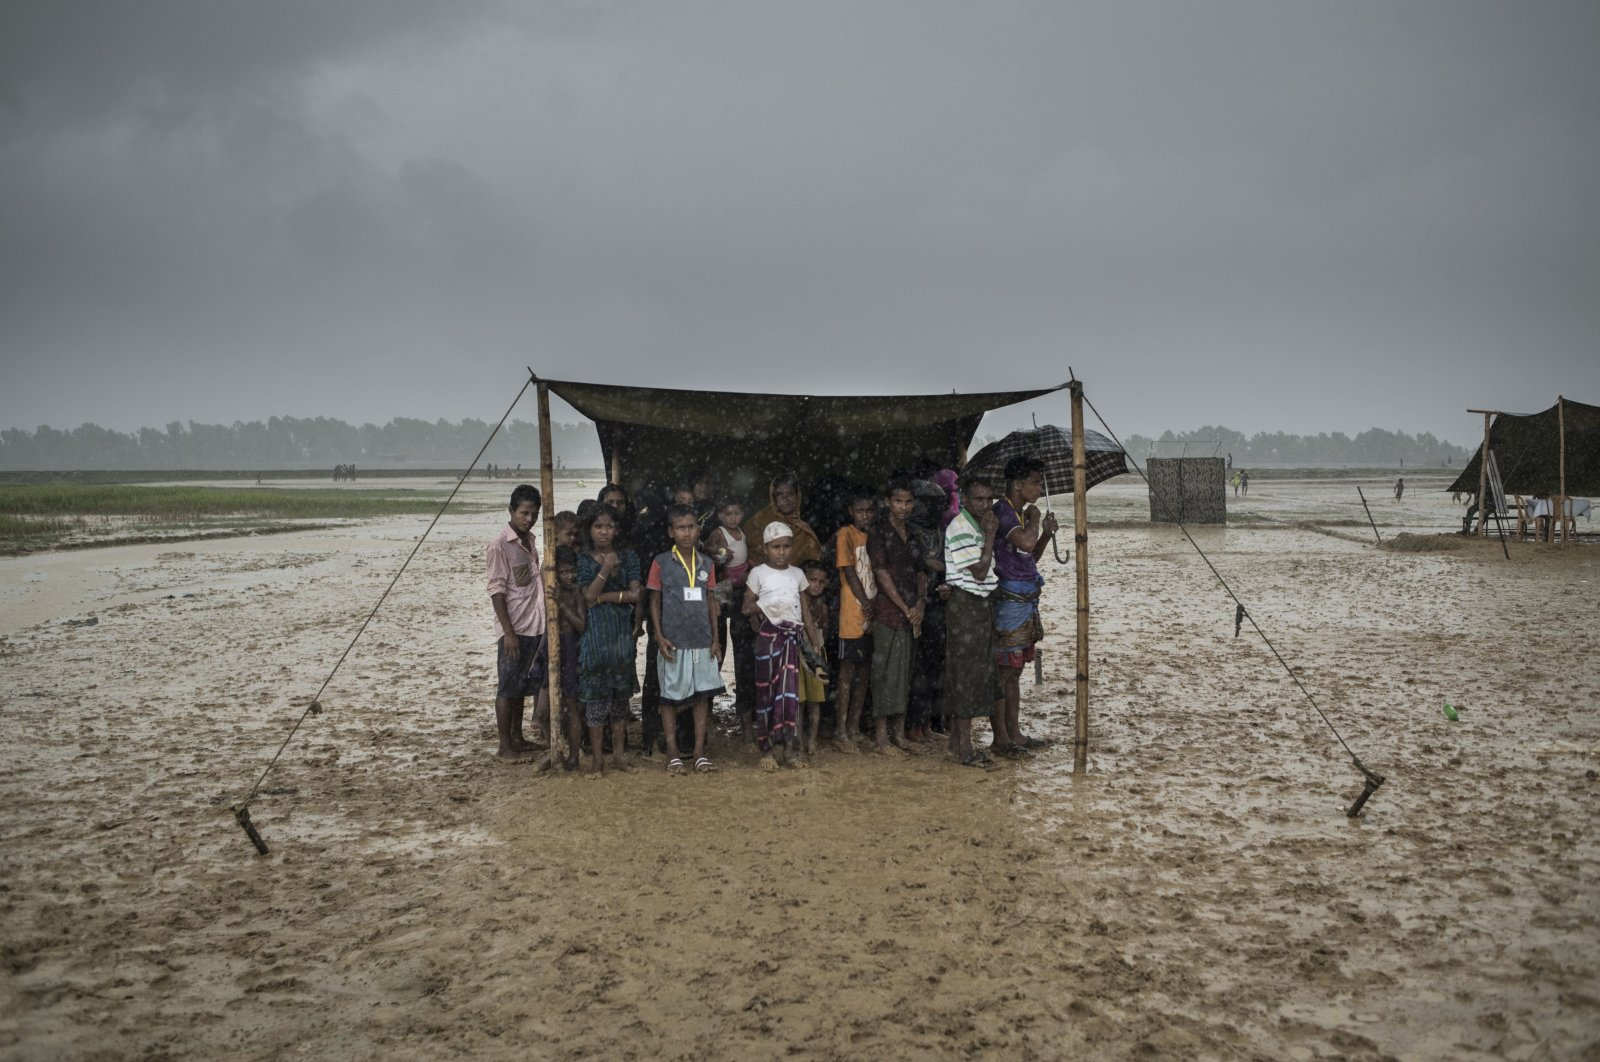 Rohingya Muslim refugees take shelter from the rain during a food distribution at Nayapara refugee camp in Bangladesh's Ukhia district on October 6, 2017. (AFP Photo)